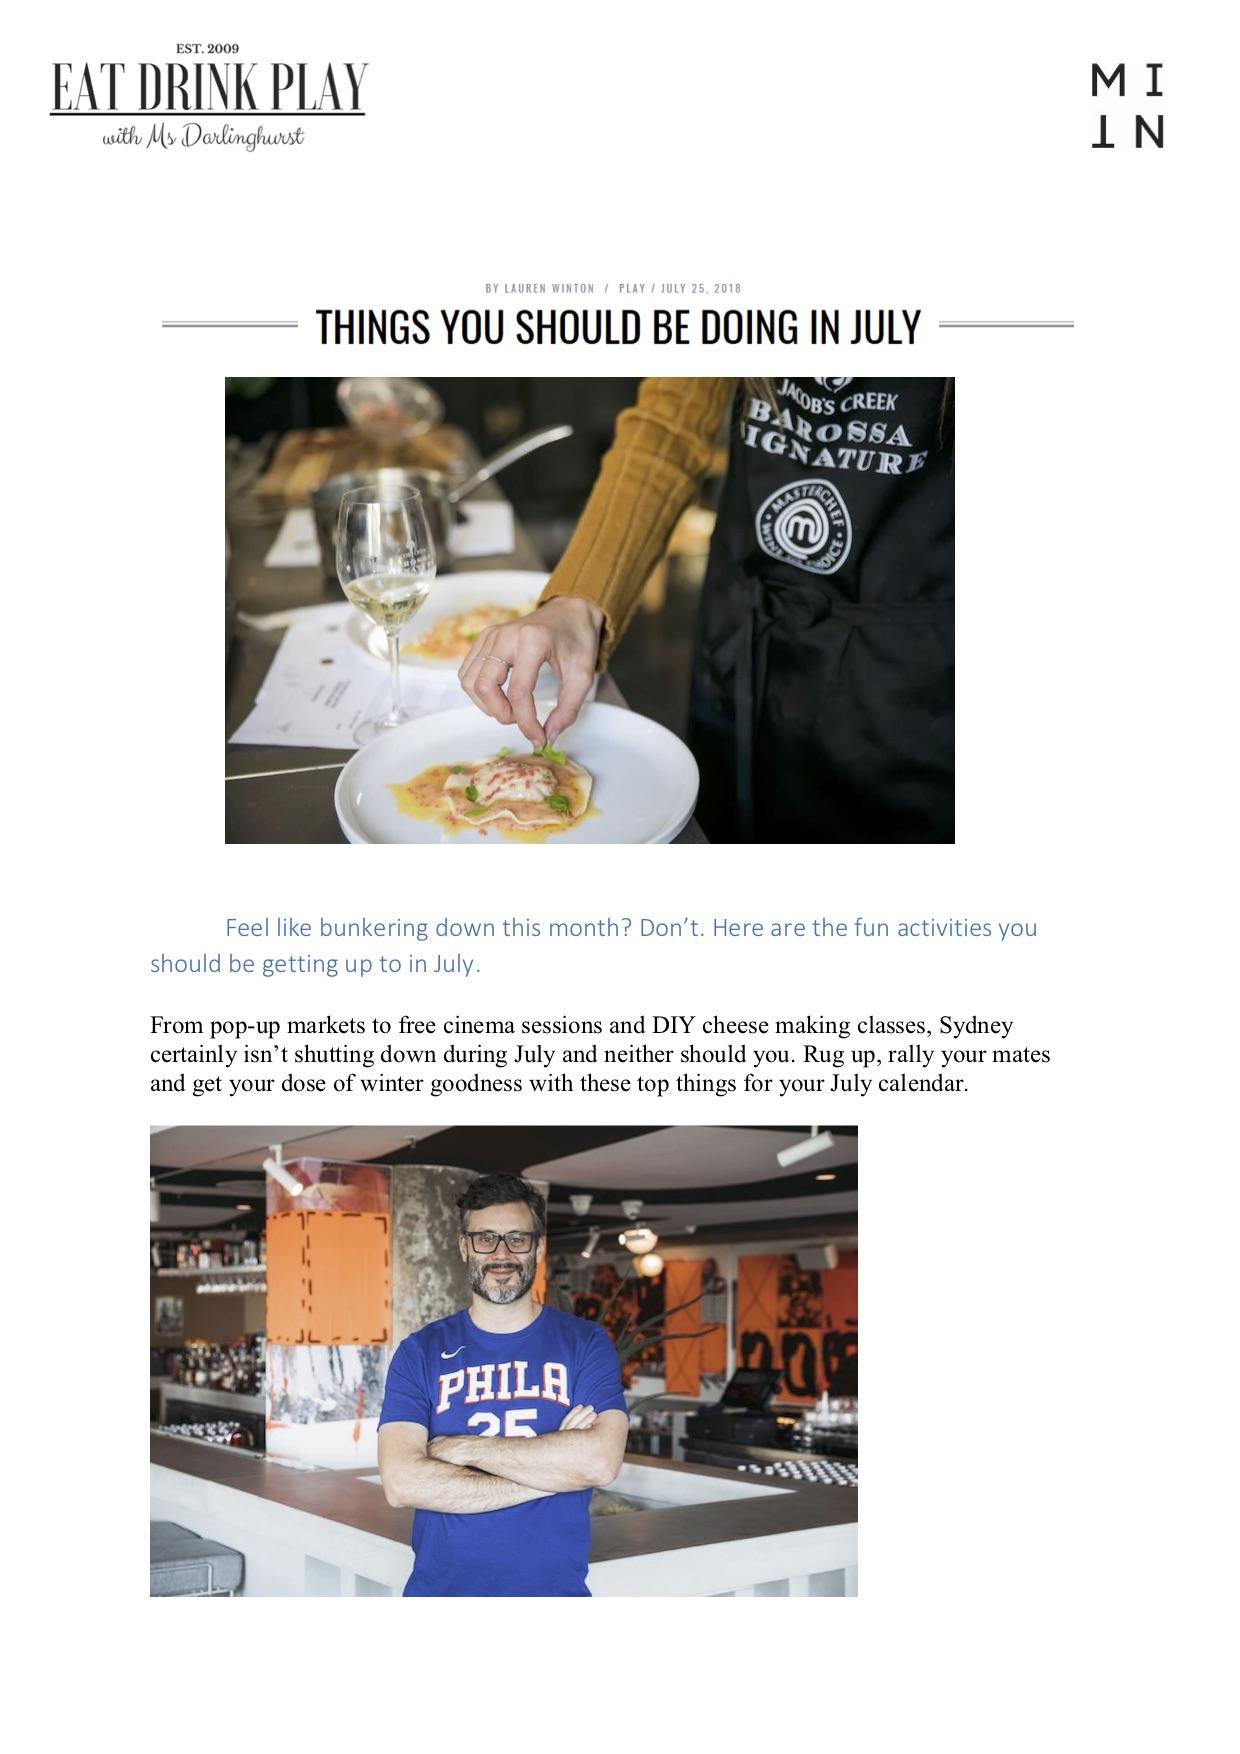 20180725 www.eatdrinkplay.com.au Jacob's Creek.jpg